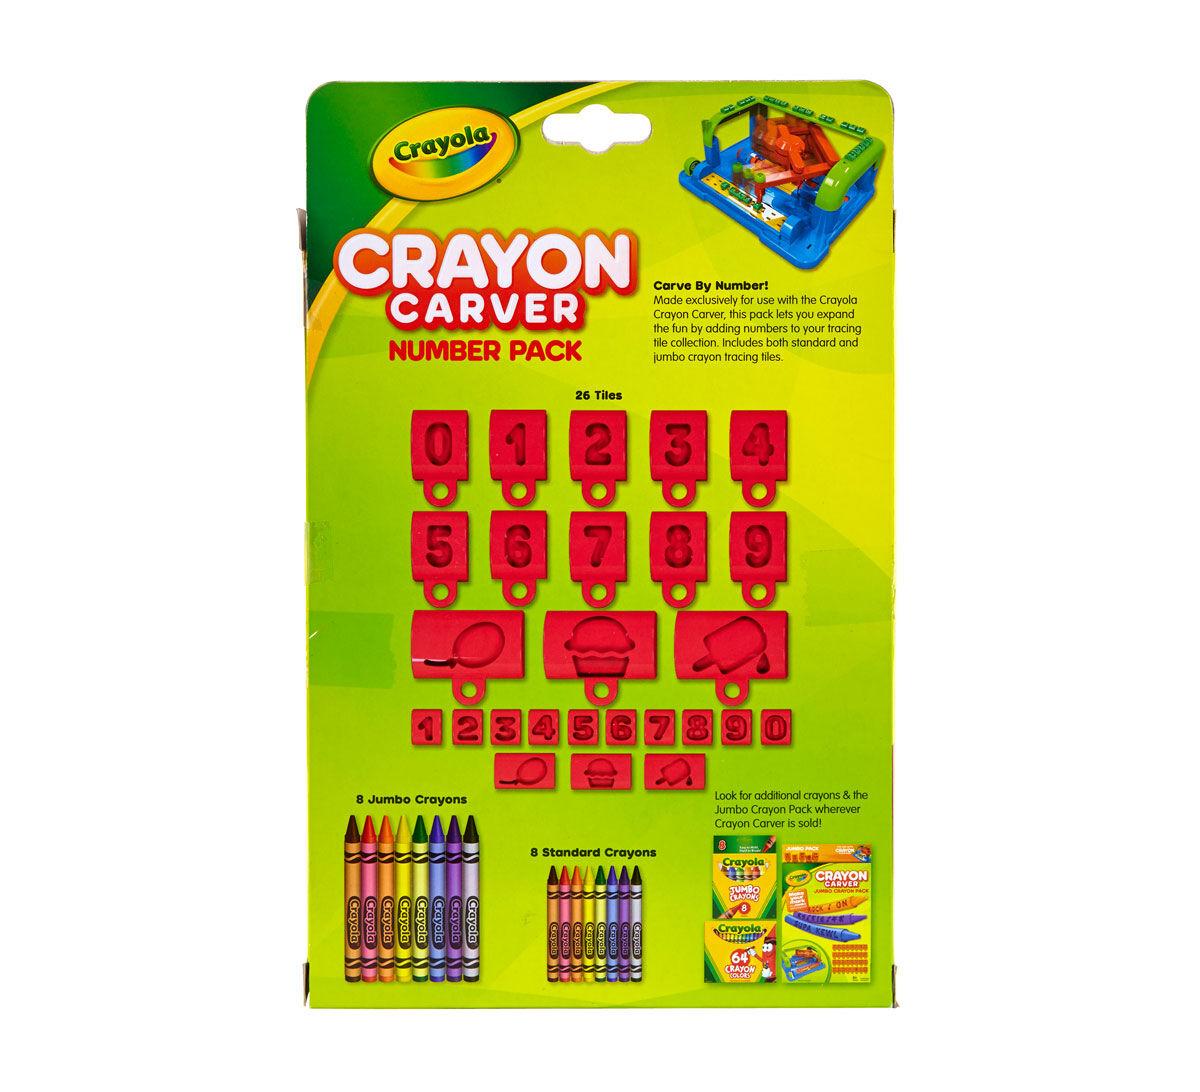 Crayon Carver Number Expansion Pack - Crayola